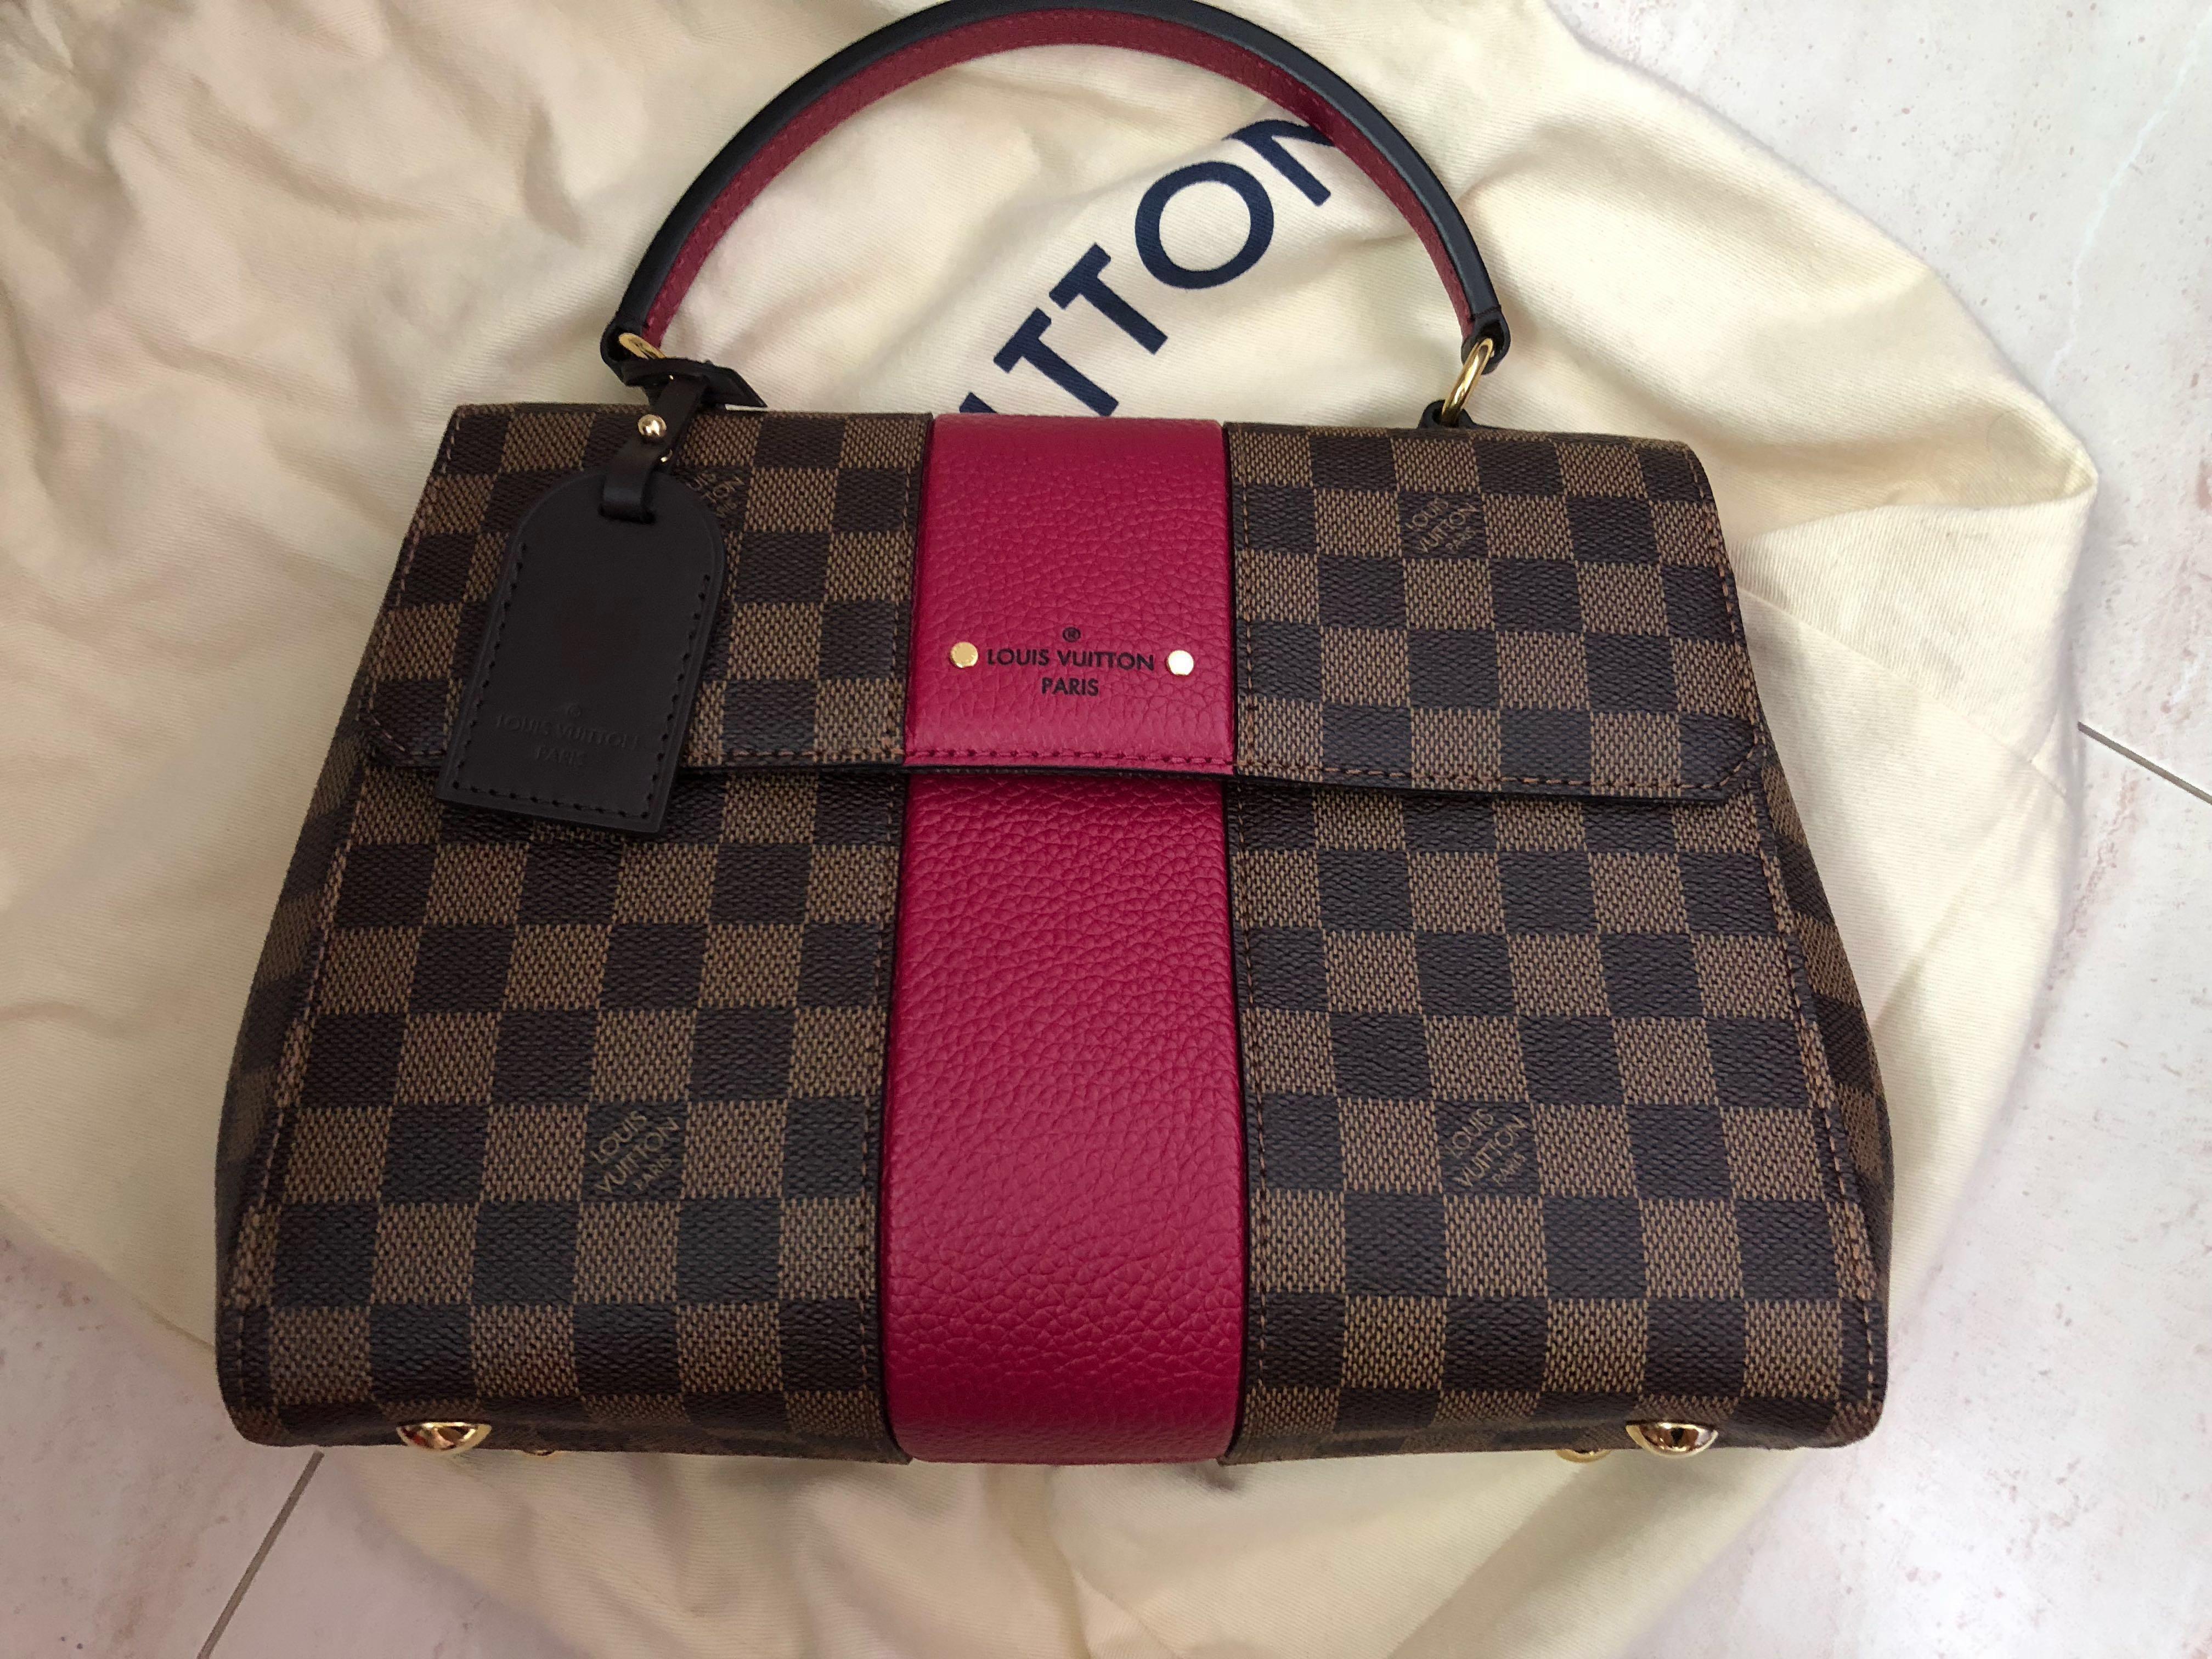 de8c409e2d1 Louis Vuitton Bond Street model N44053 , Luxury, Bags & Wallets ...